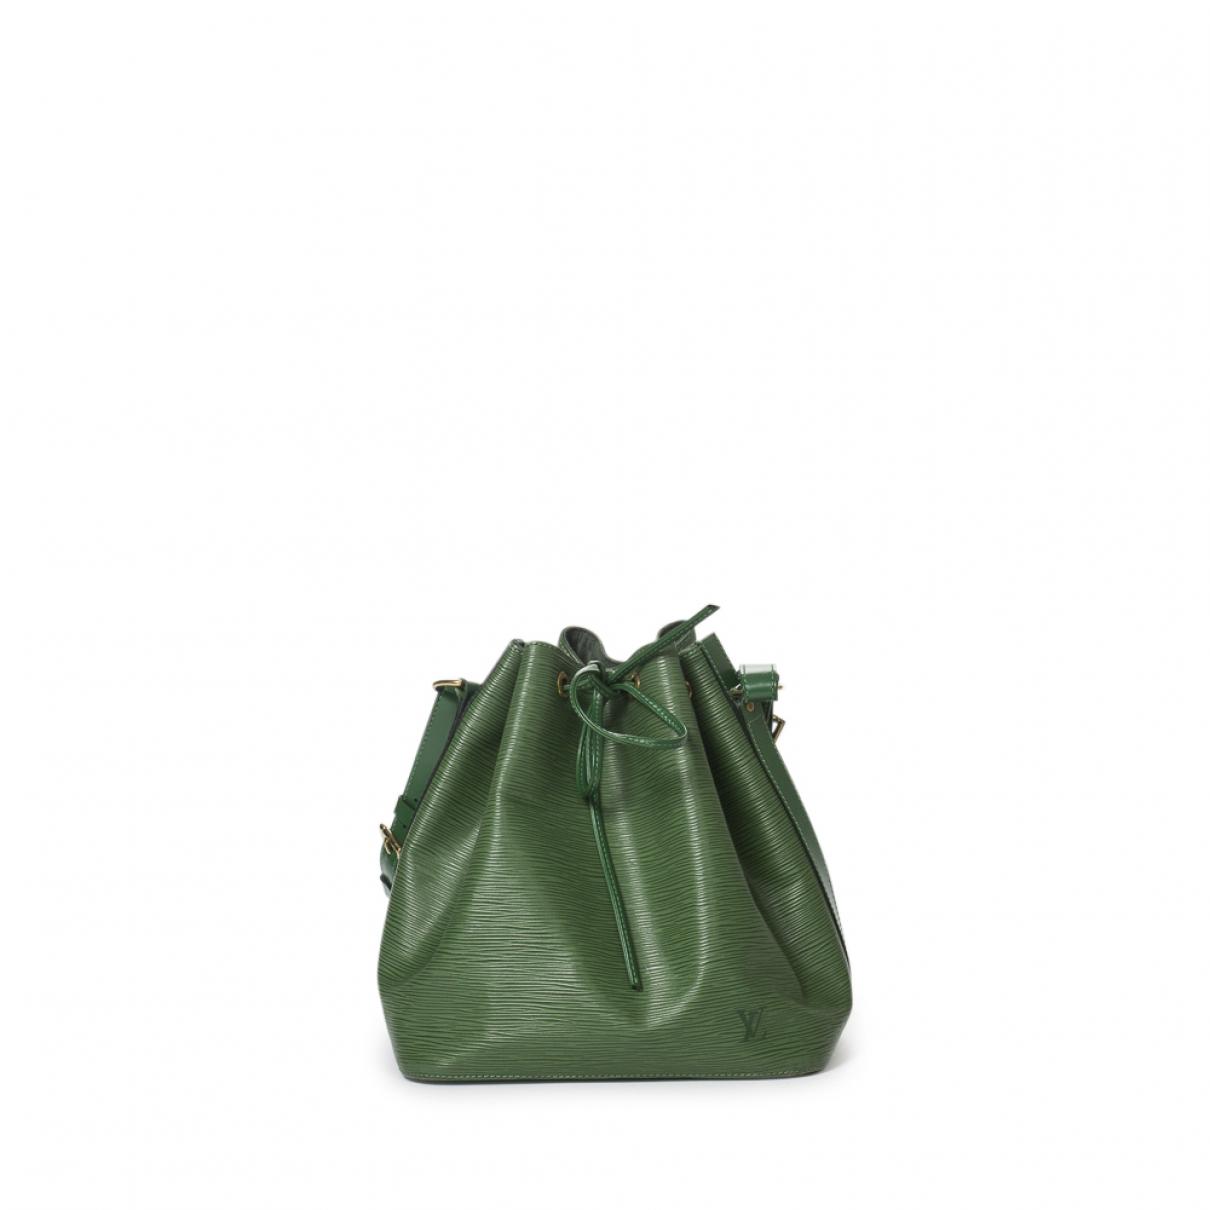 Louis Vuitton - Sac a main Noe pour femme en cuir - vert